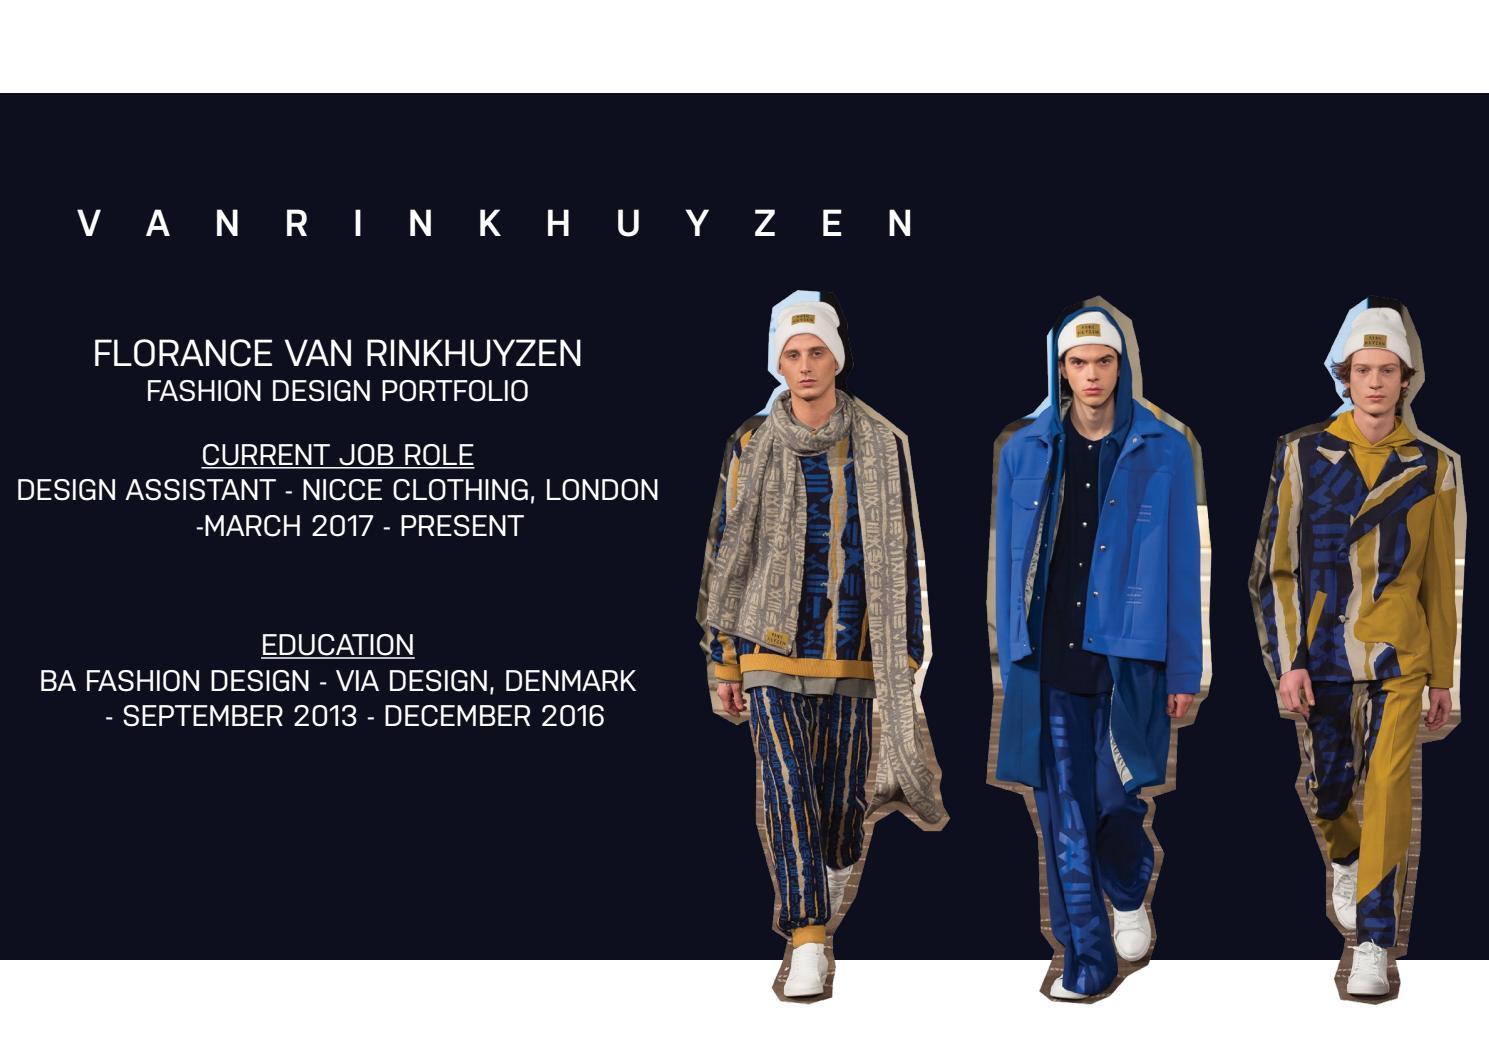 Florance Van Rinkhuyzen Design Portfolio By Florance Van Rinkhuyzen Issuu